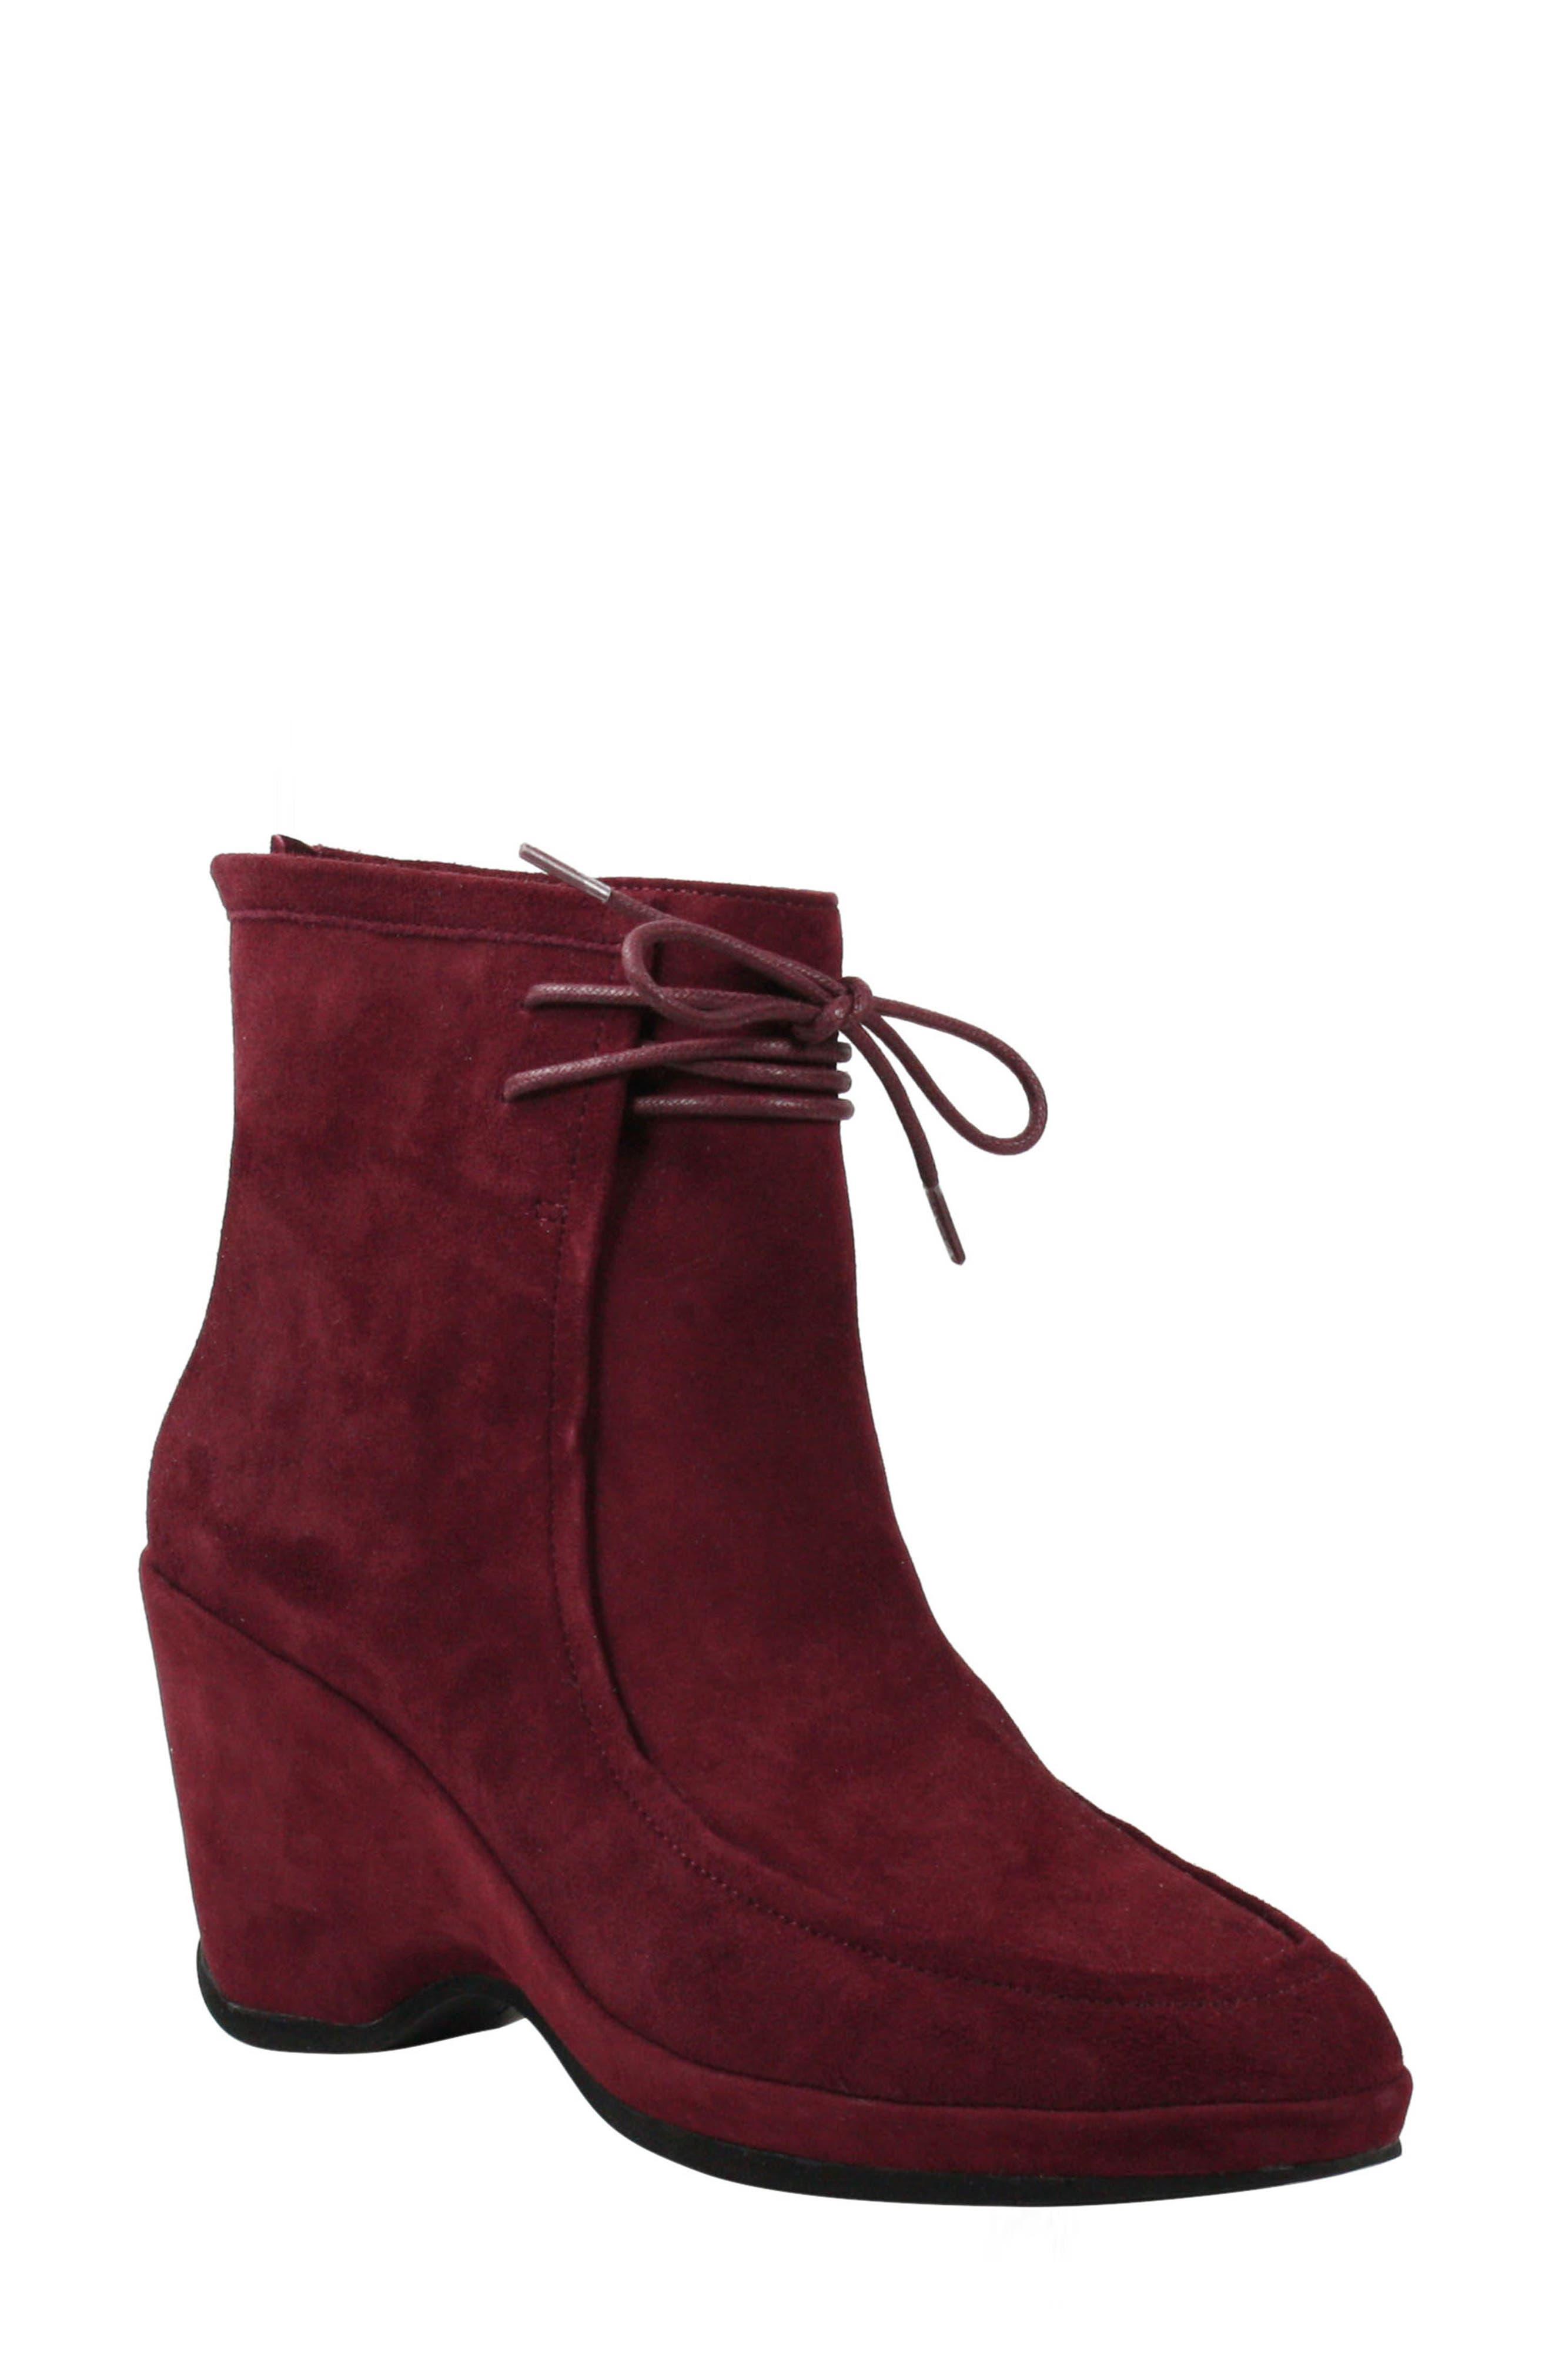 1950s Style Shoes | Heels, Flats, Saddle Shoes Womens LAmour Des Pieds Olesia Boot Size 9.5 M - Burgundy $129.89 AT vintagedancer.com